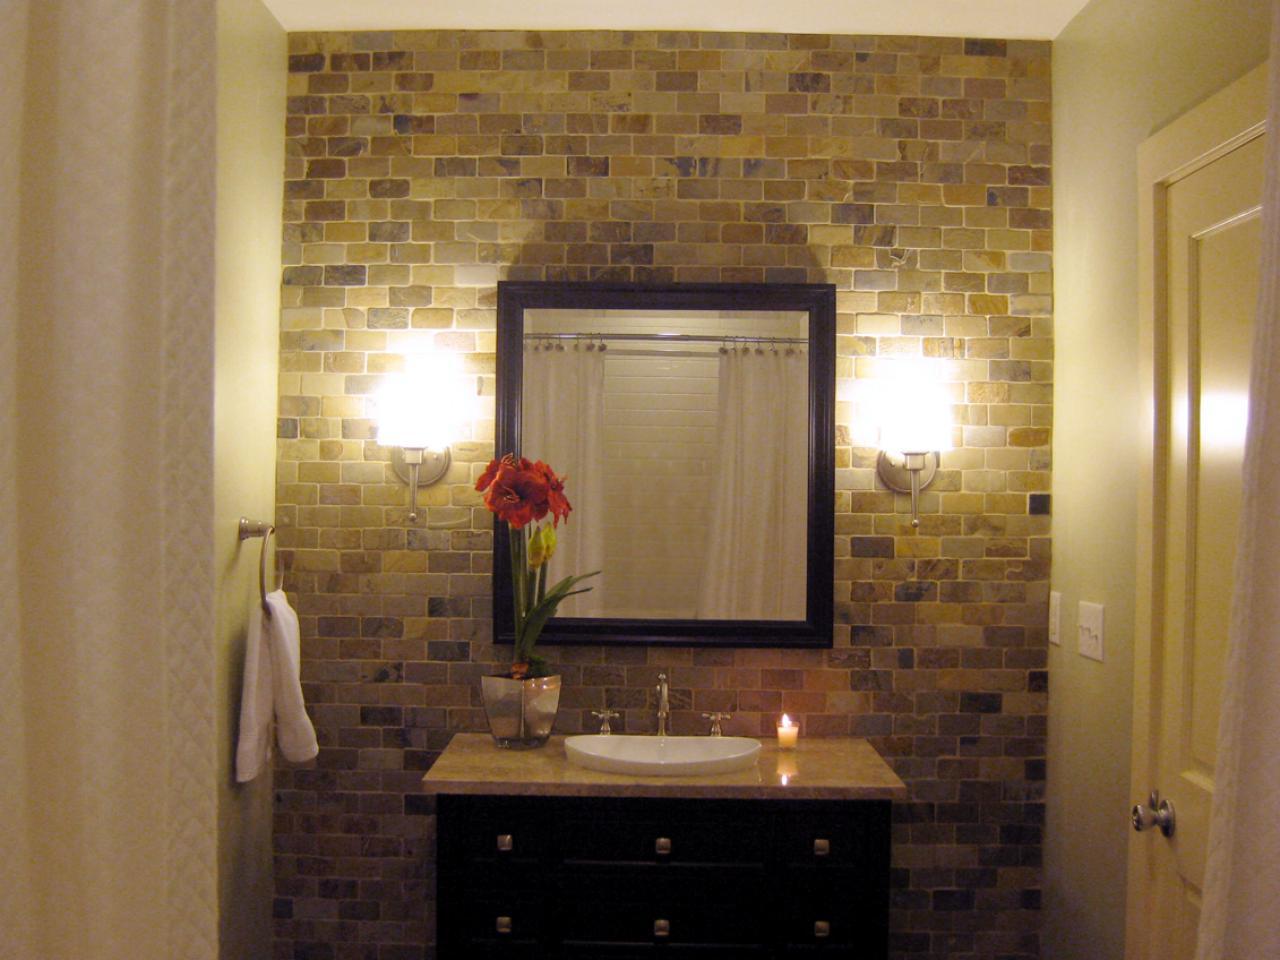 RMS_budget-bath-basement_s4x3.jpg.rend.hgtvcom.1280.960